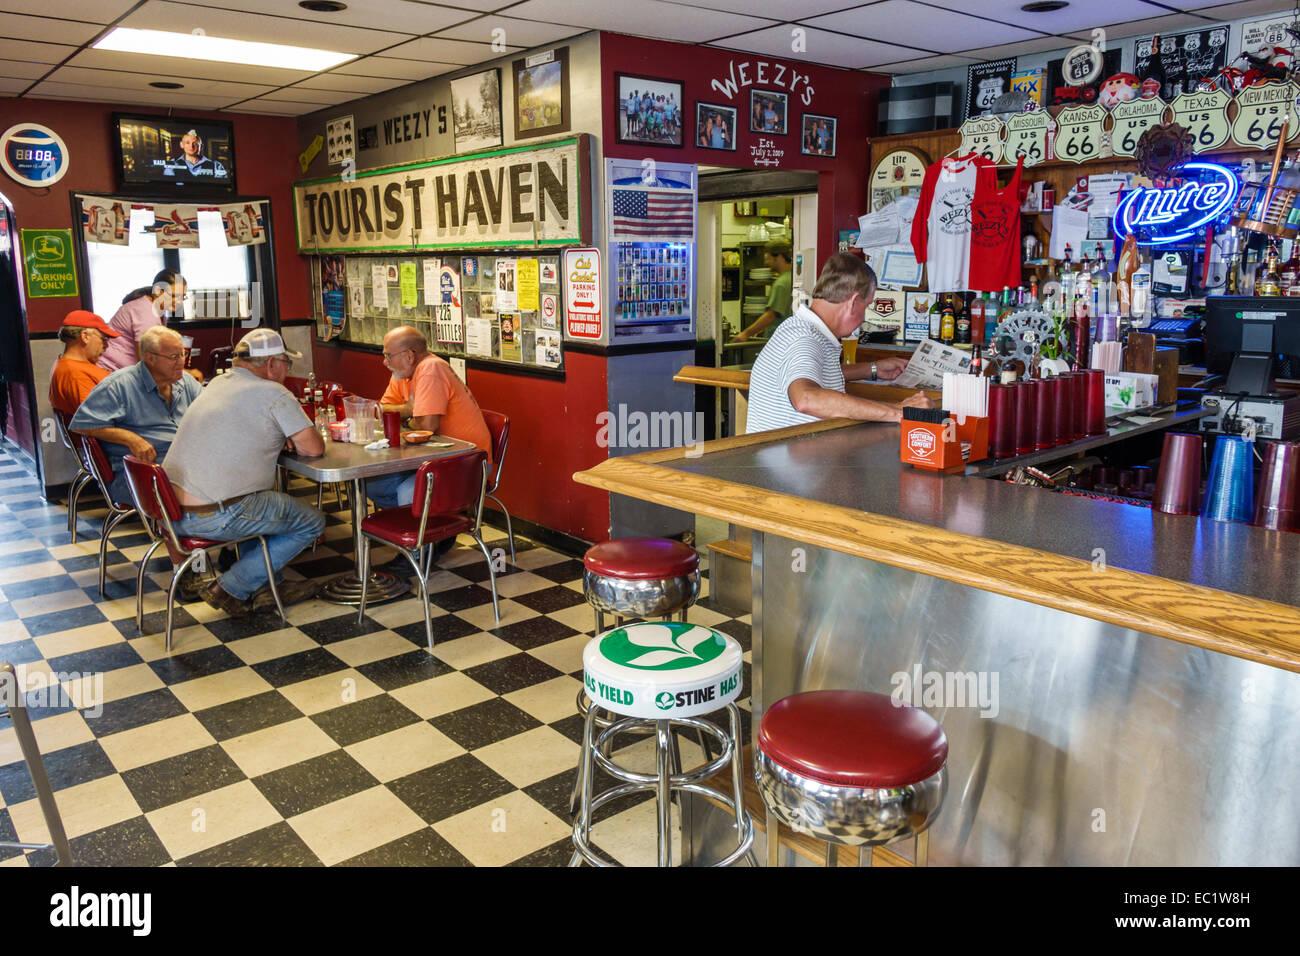 illinois hamel historic route 66 weezy's restaurant inside interior